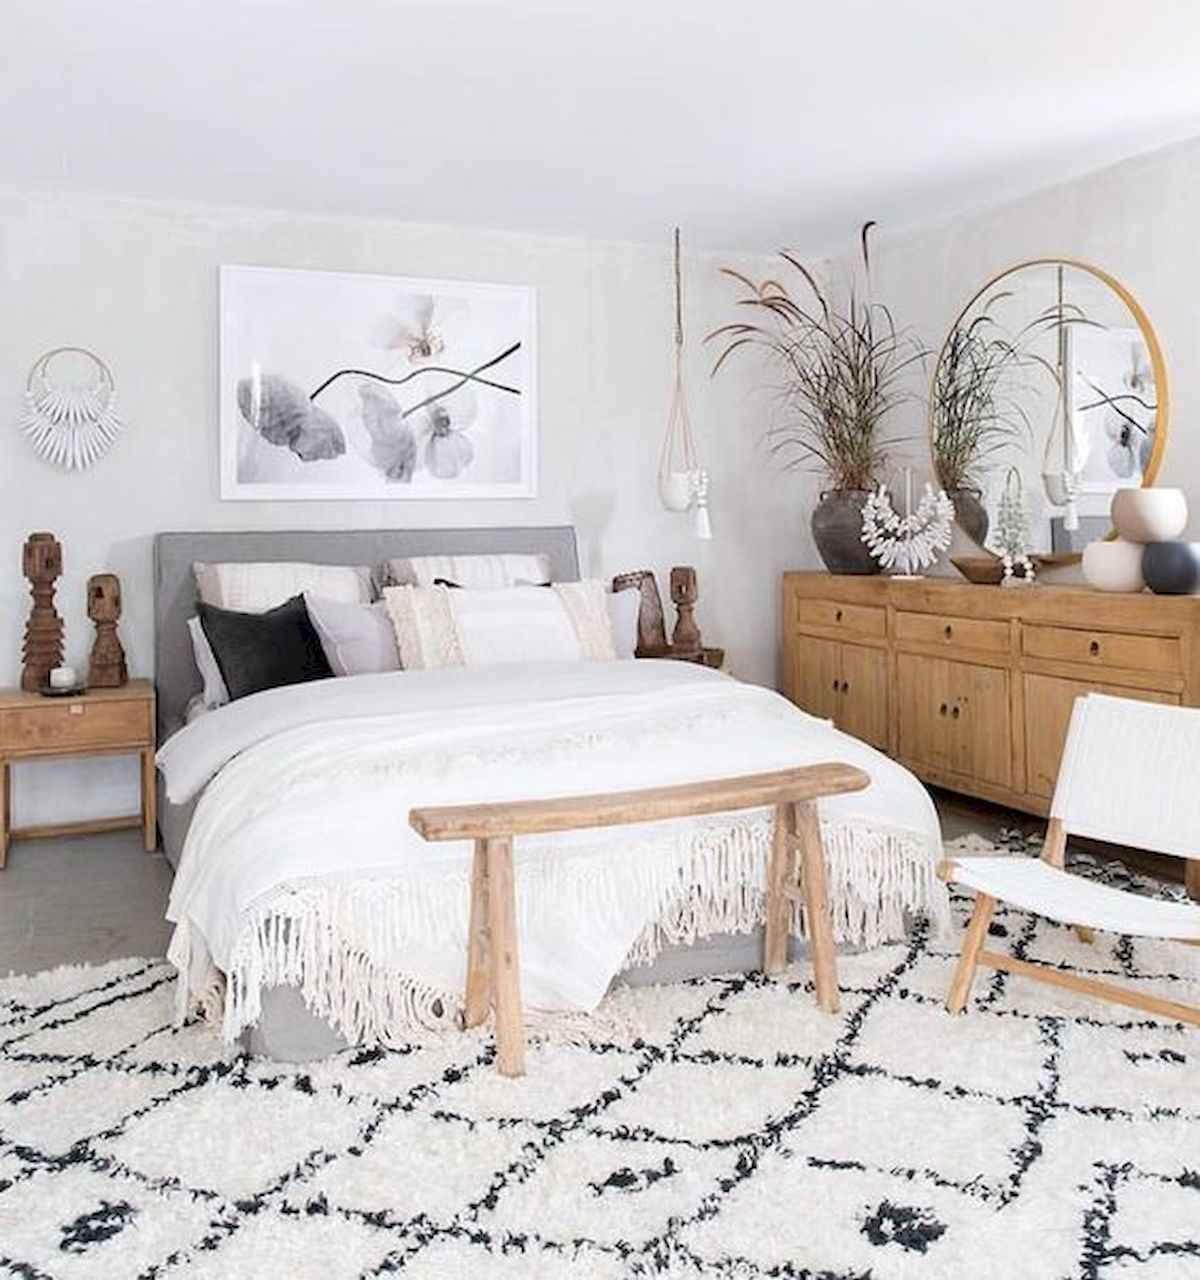 Modern Stylish Bedroom Design Ideas Of 2020: 60 Adorable Modern Farmhouse Bedroom Design Ideas And